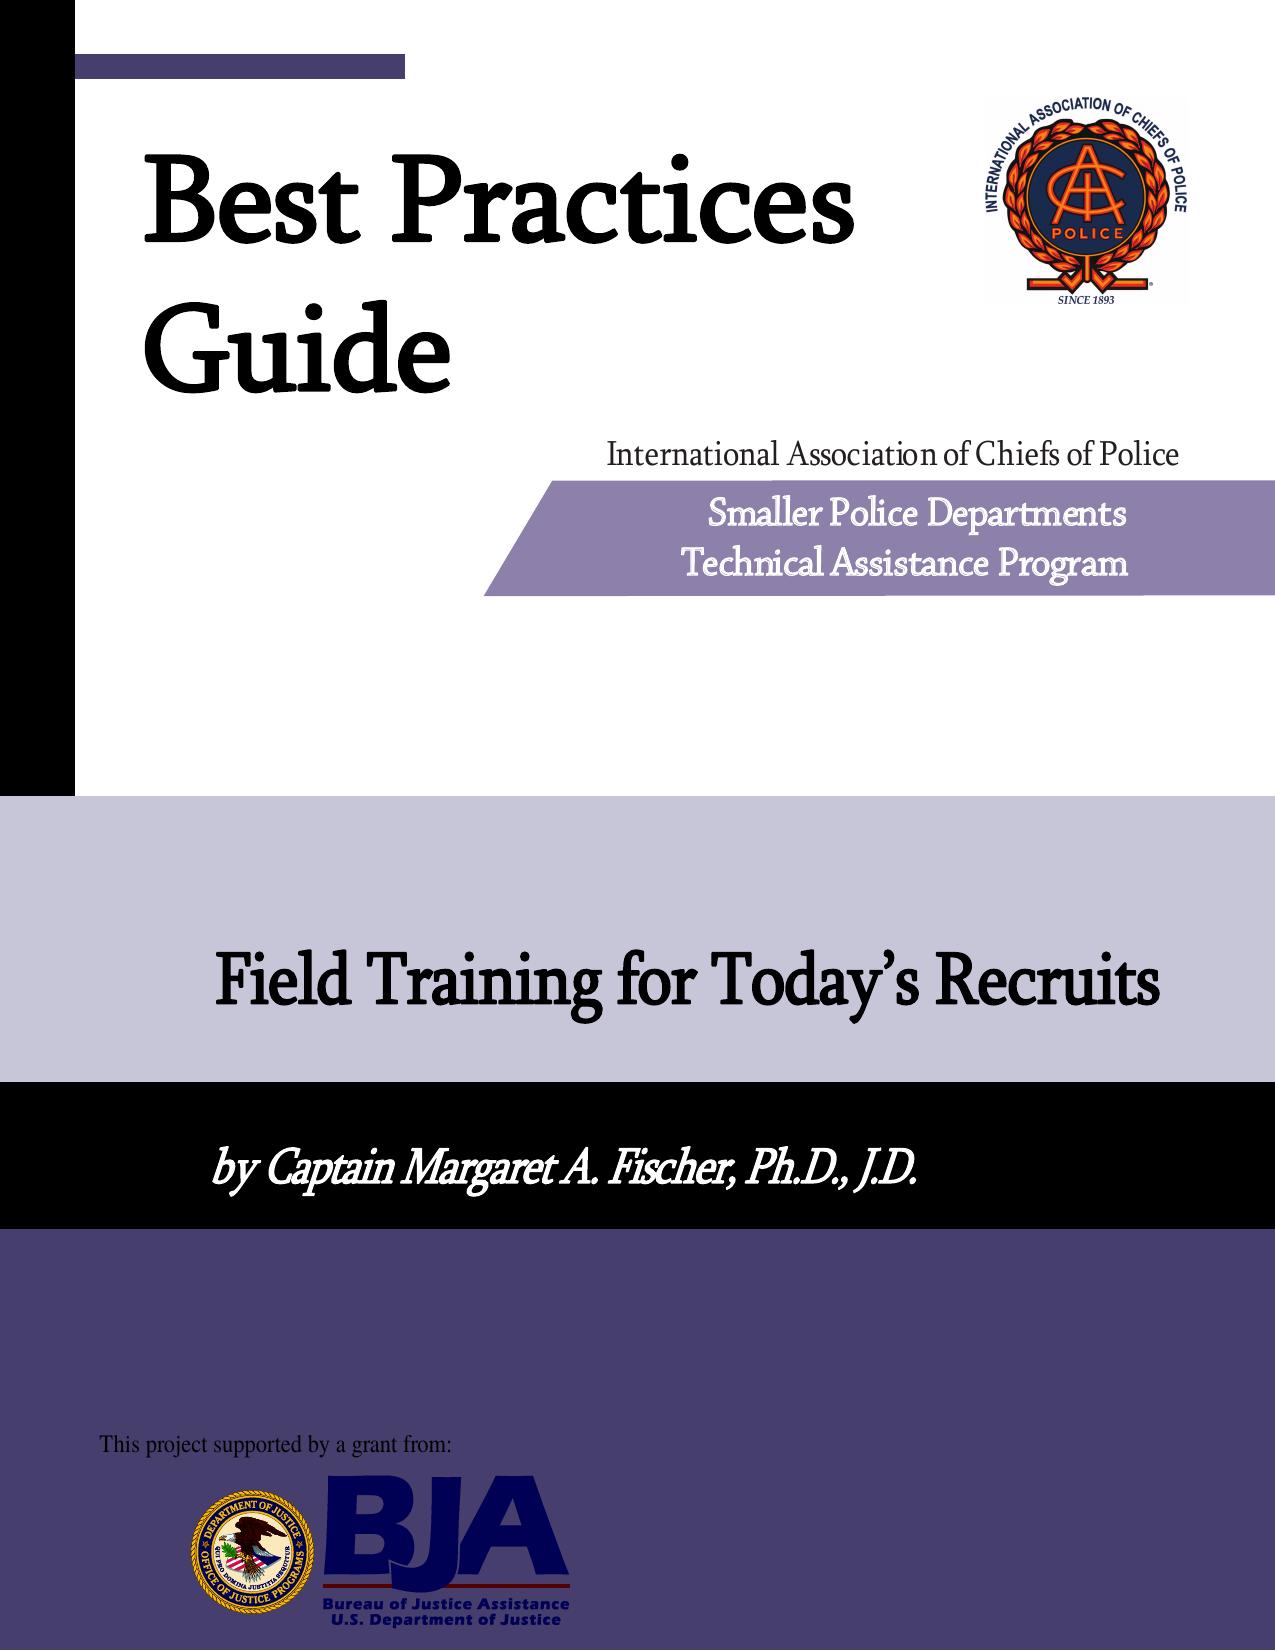 Field Training